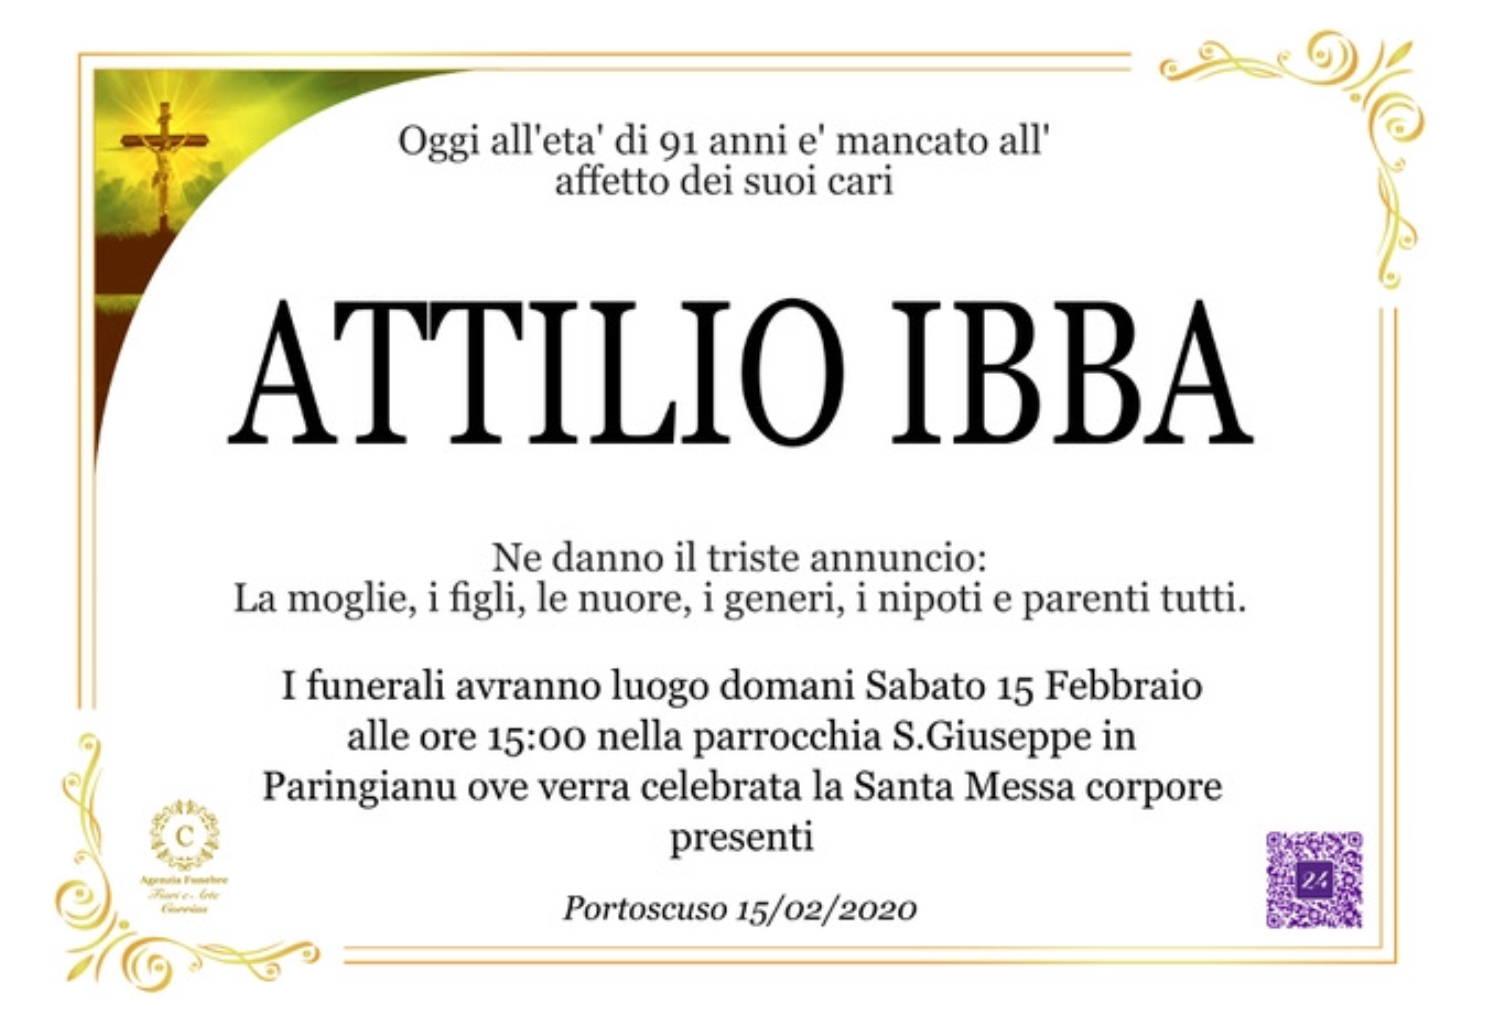 Attilio Ibba